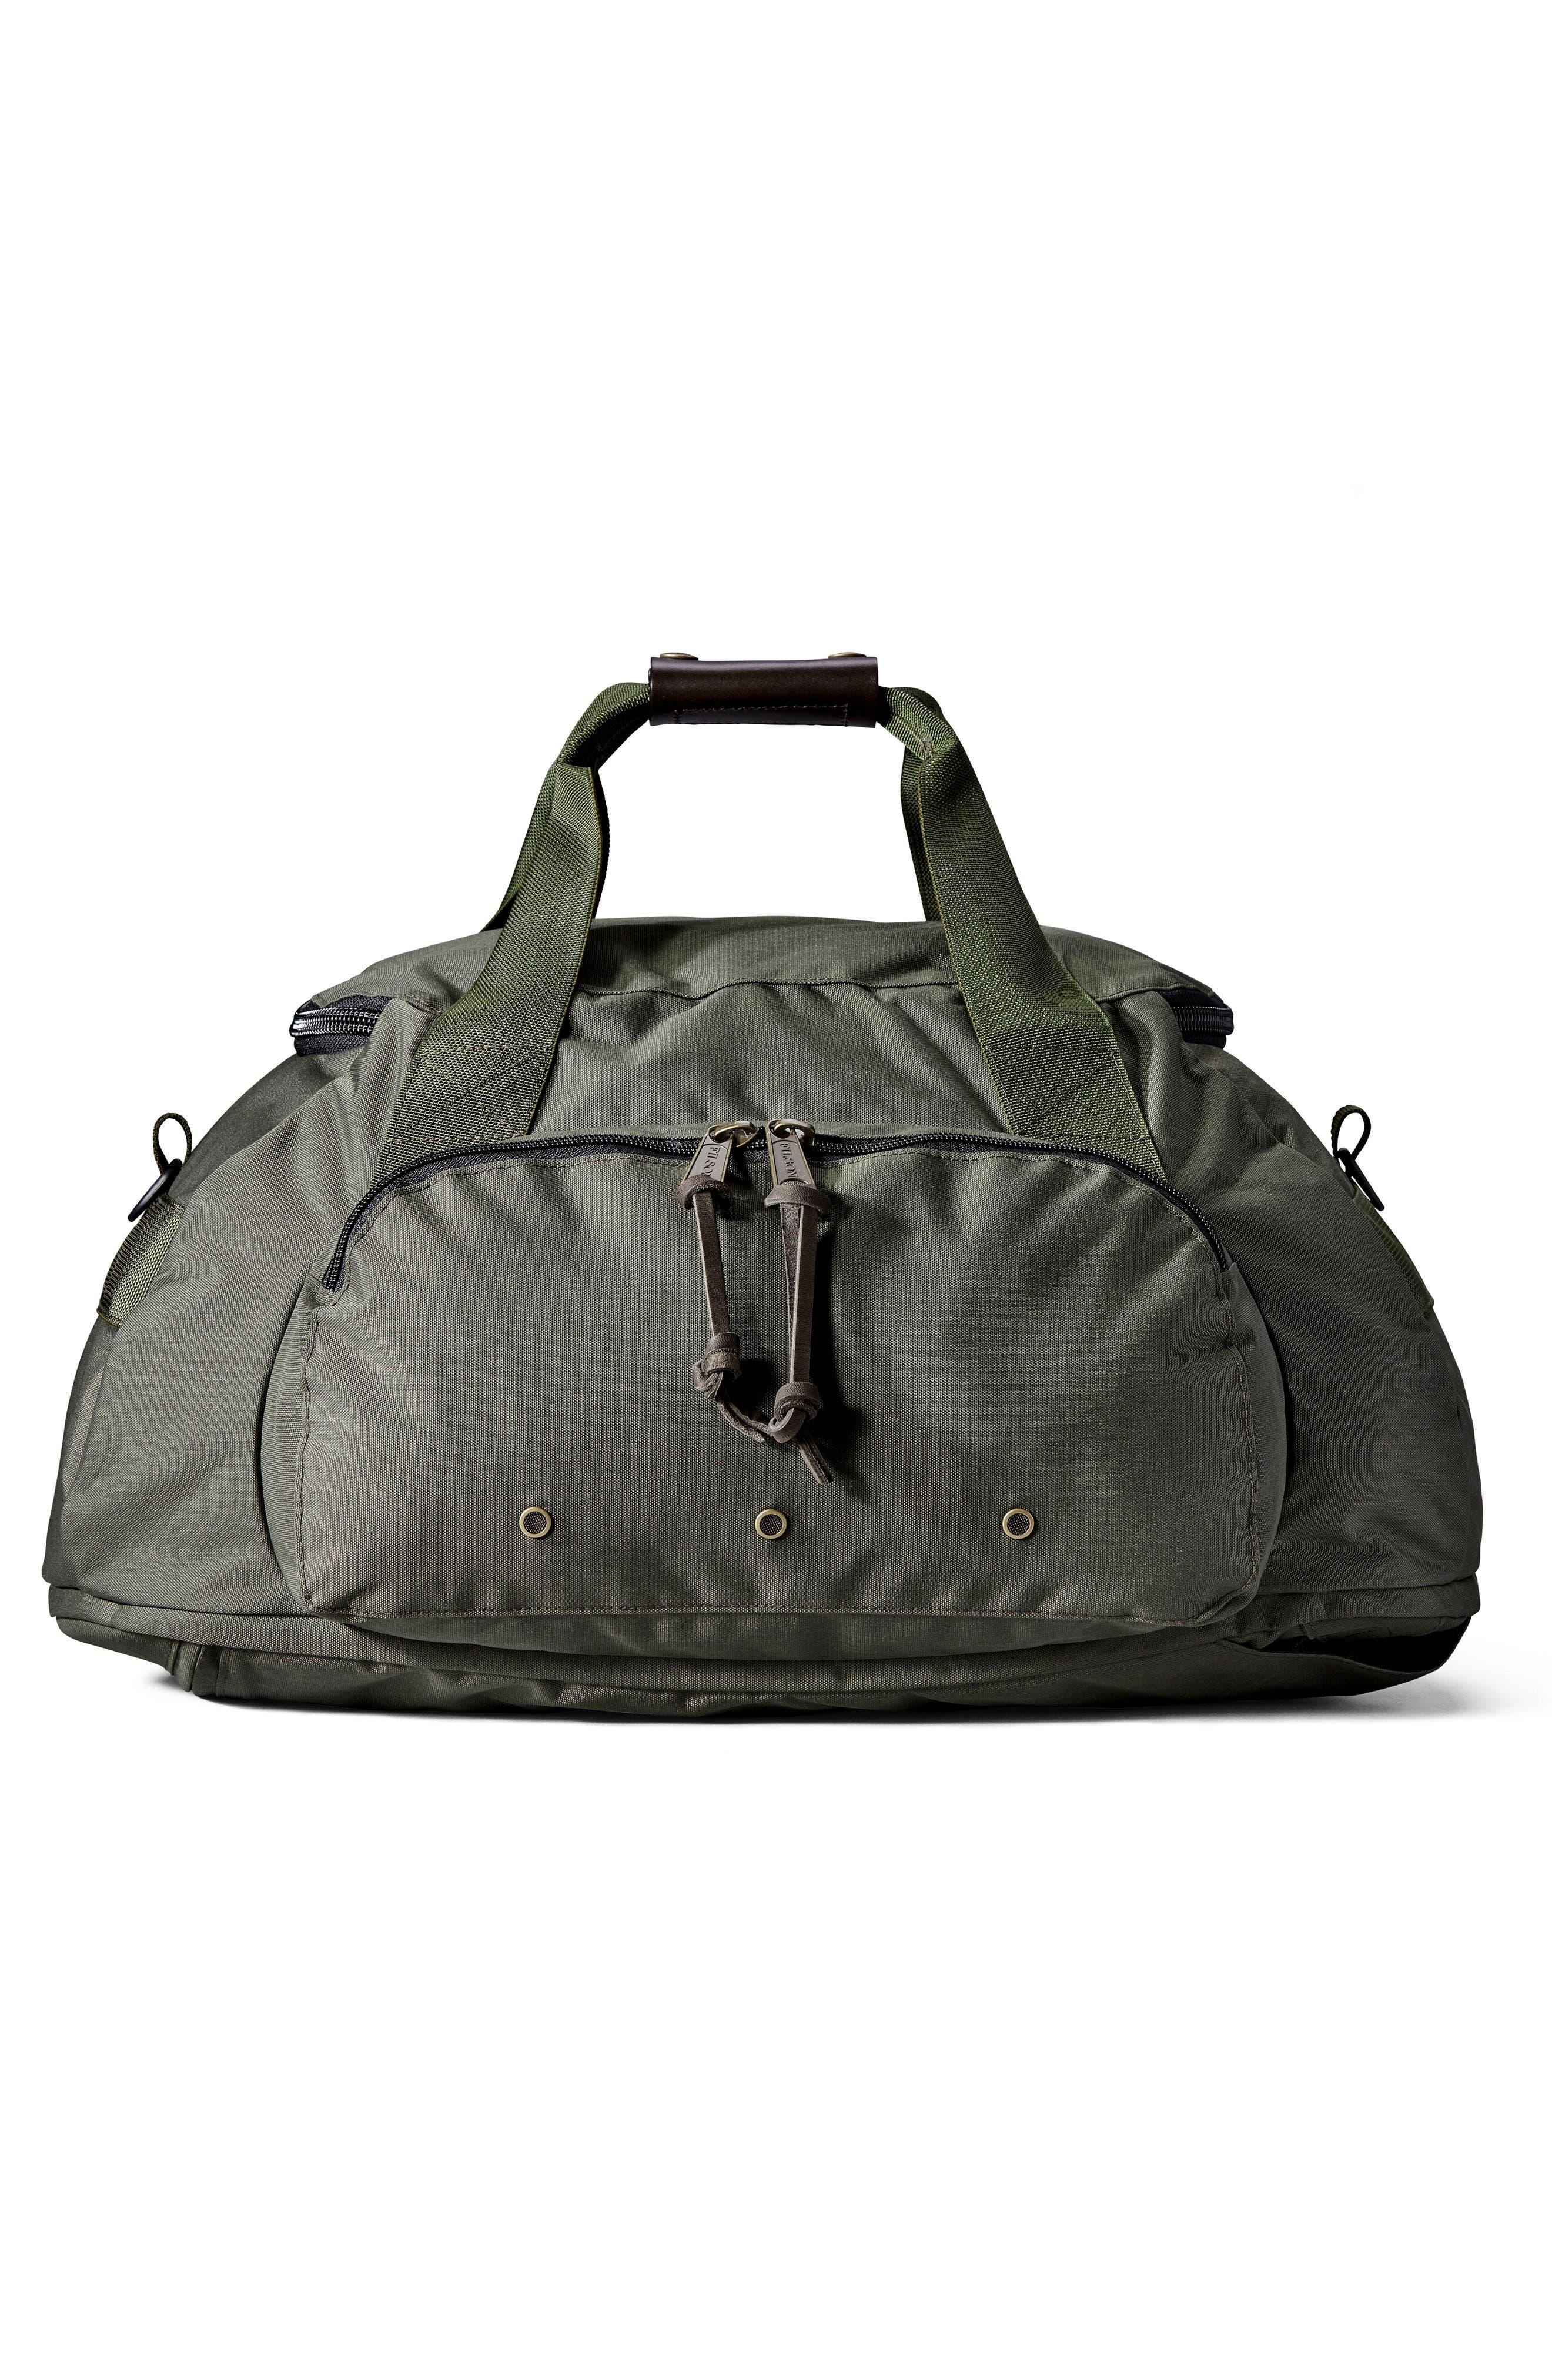 Convertible Duffel Bag,                             Alternate thumbnail 5, color,                             Otter Green